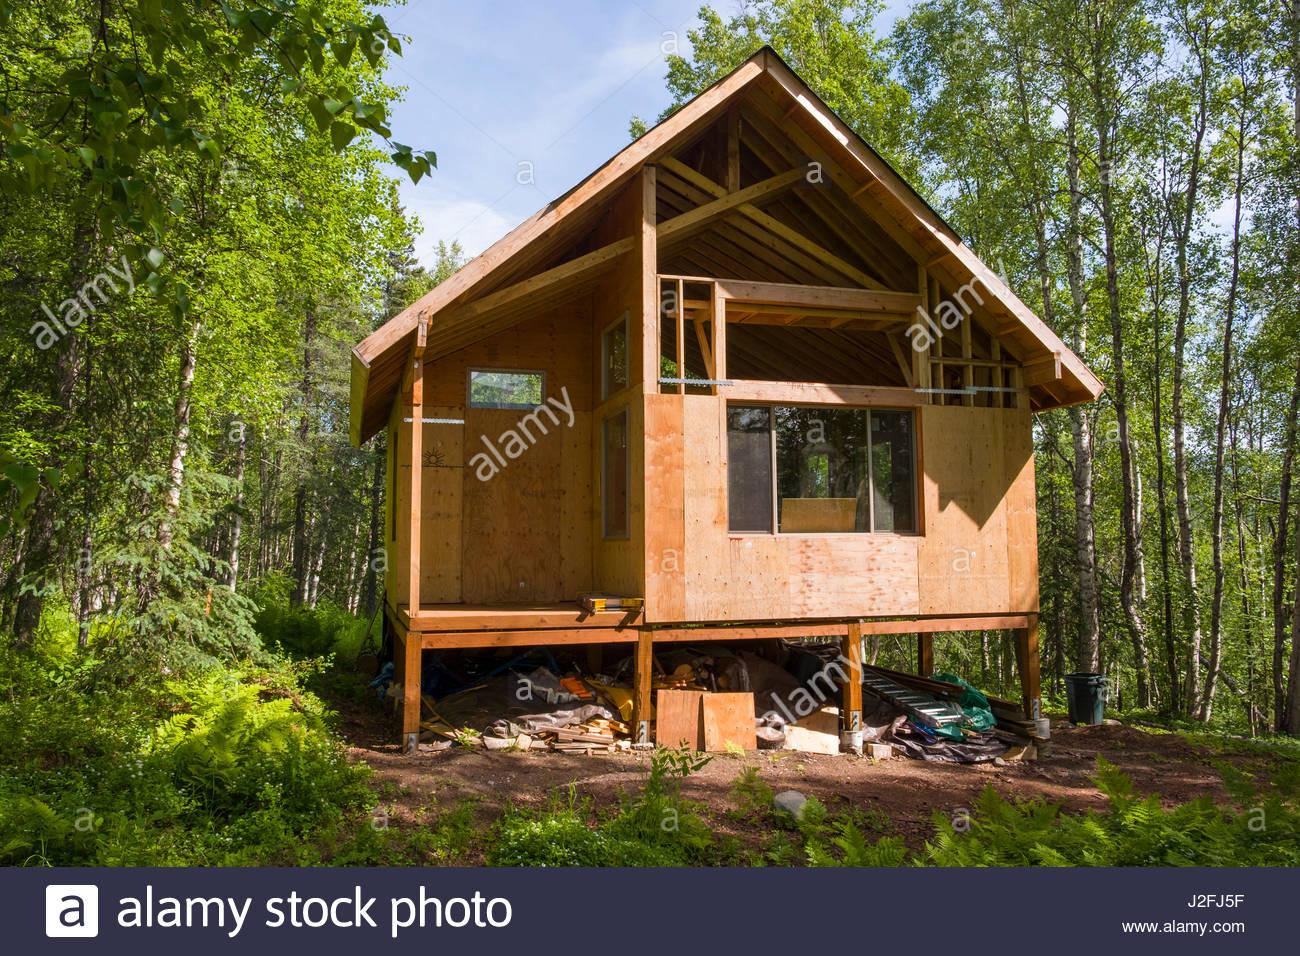 Remote off-grid Alaskan cabin under construction, Matanuska-Susitna, Alaska, USA - Stock Image